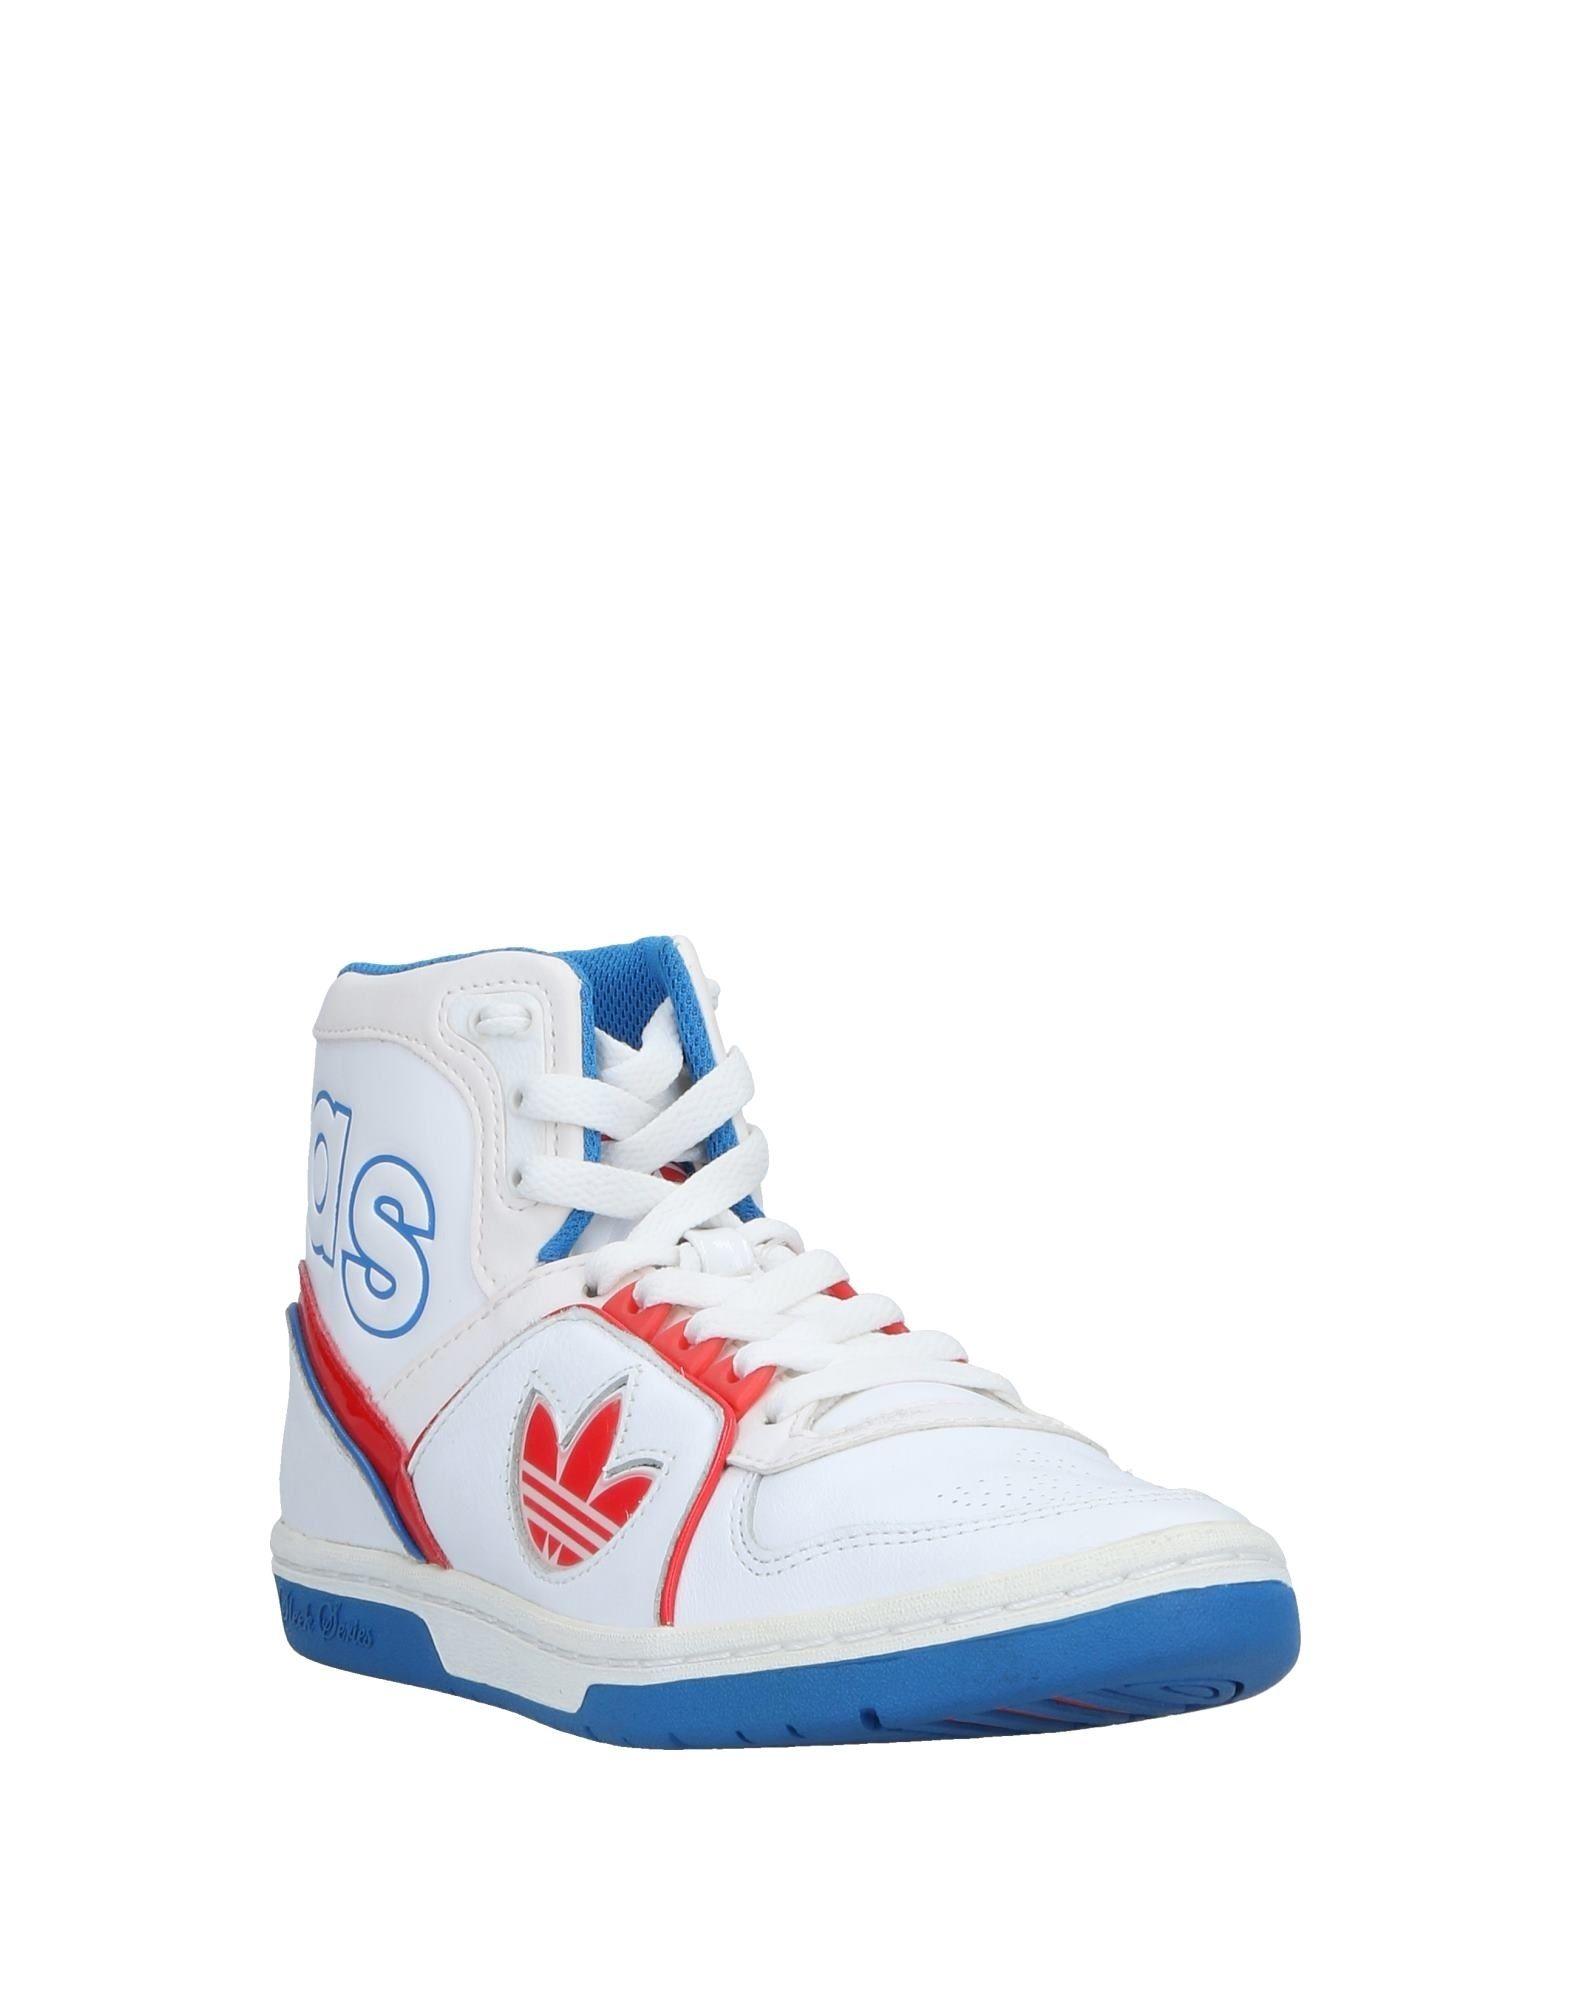 Adidas Originals Sneakers Damen  11522706WE Gute Gute 11522706WE Qualität beliebte Schuhe c4b643